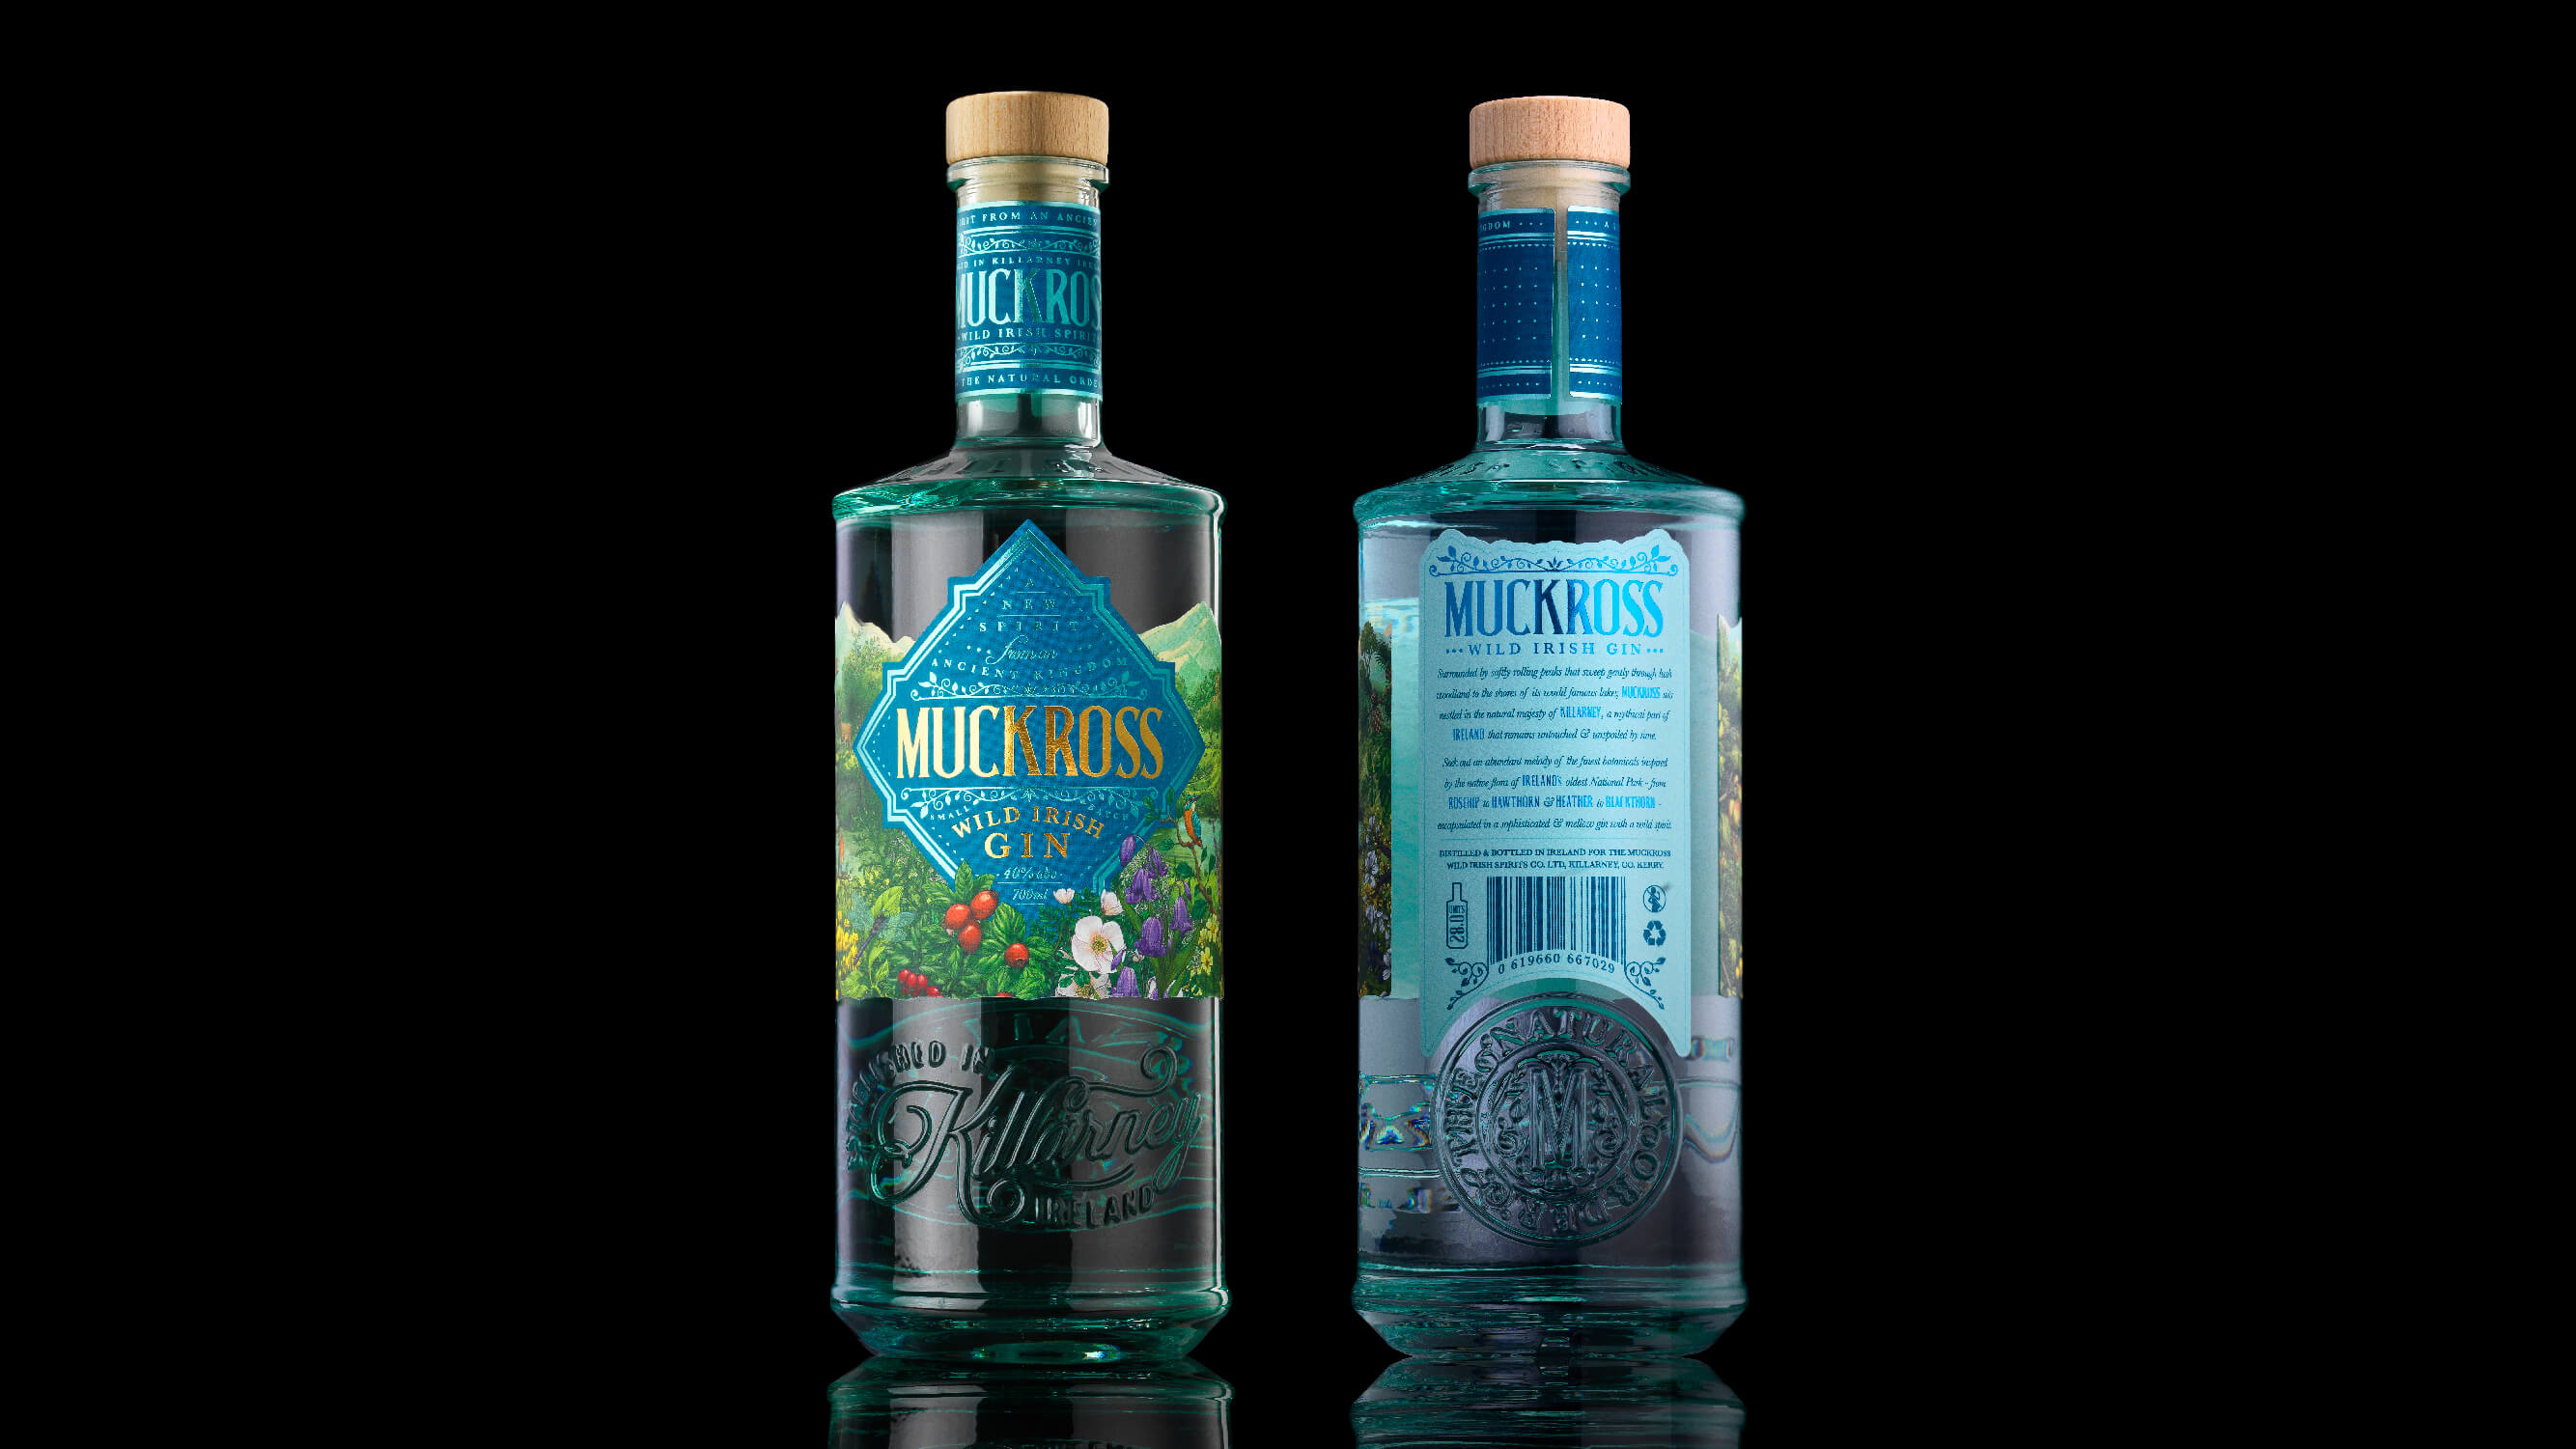 Backbar Studios Creates Distinctive New Packaging for Muckross Wild Irish Gin